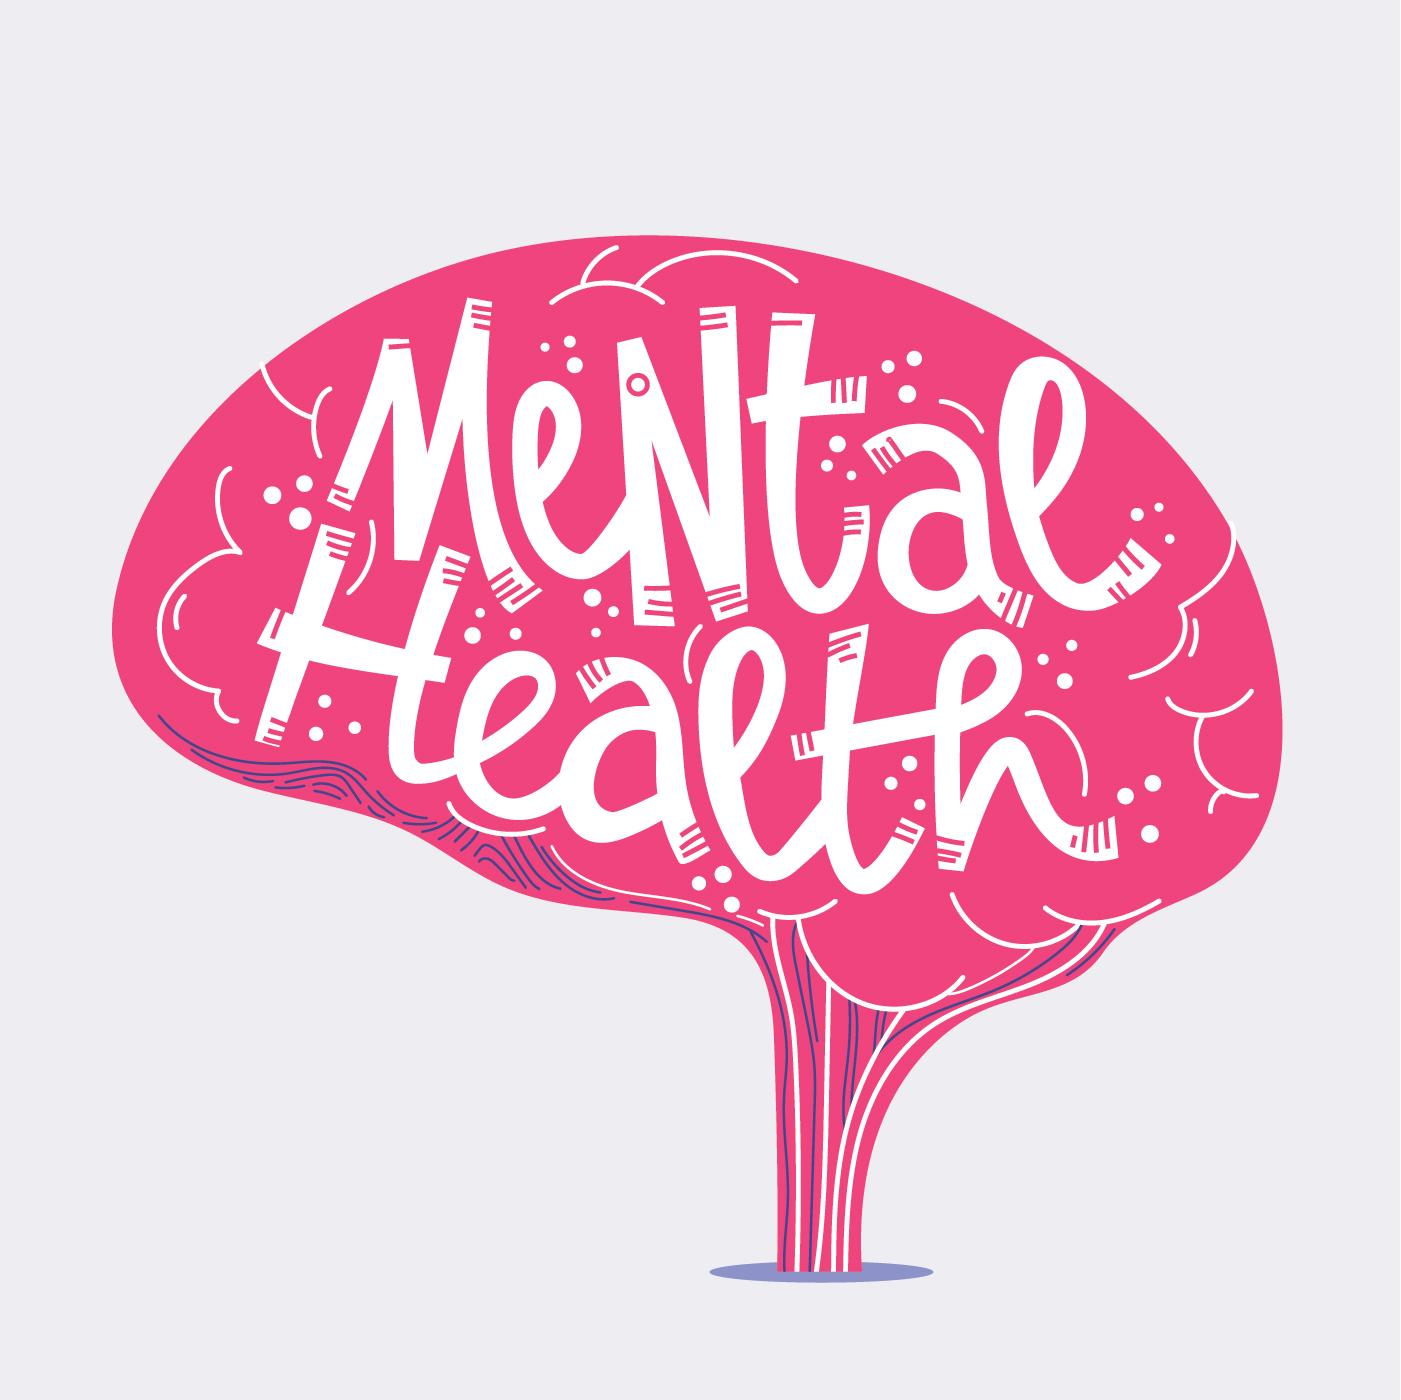 Mental Health Lettering